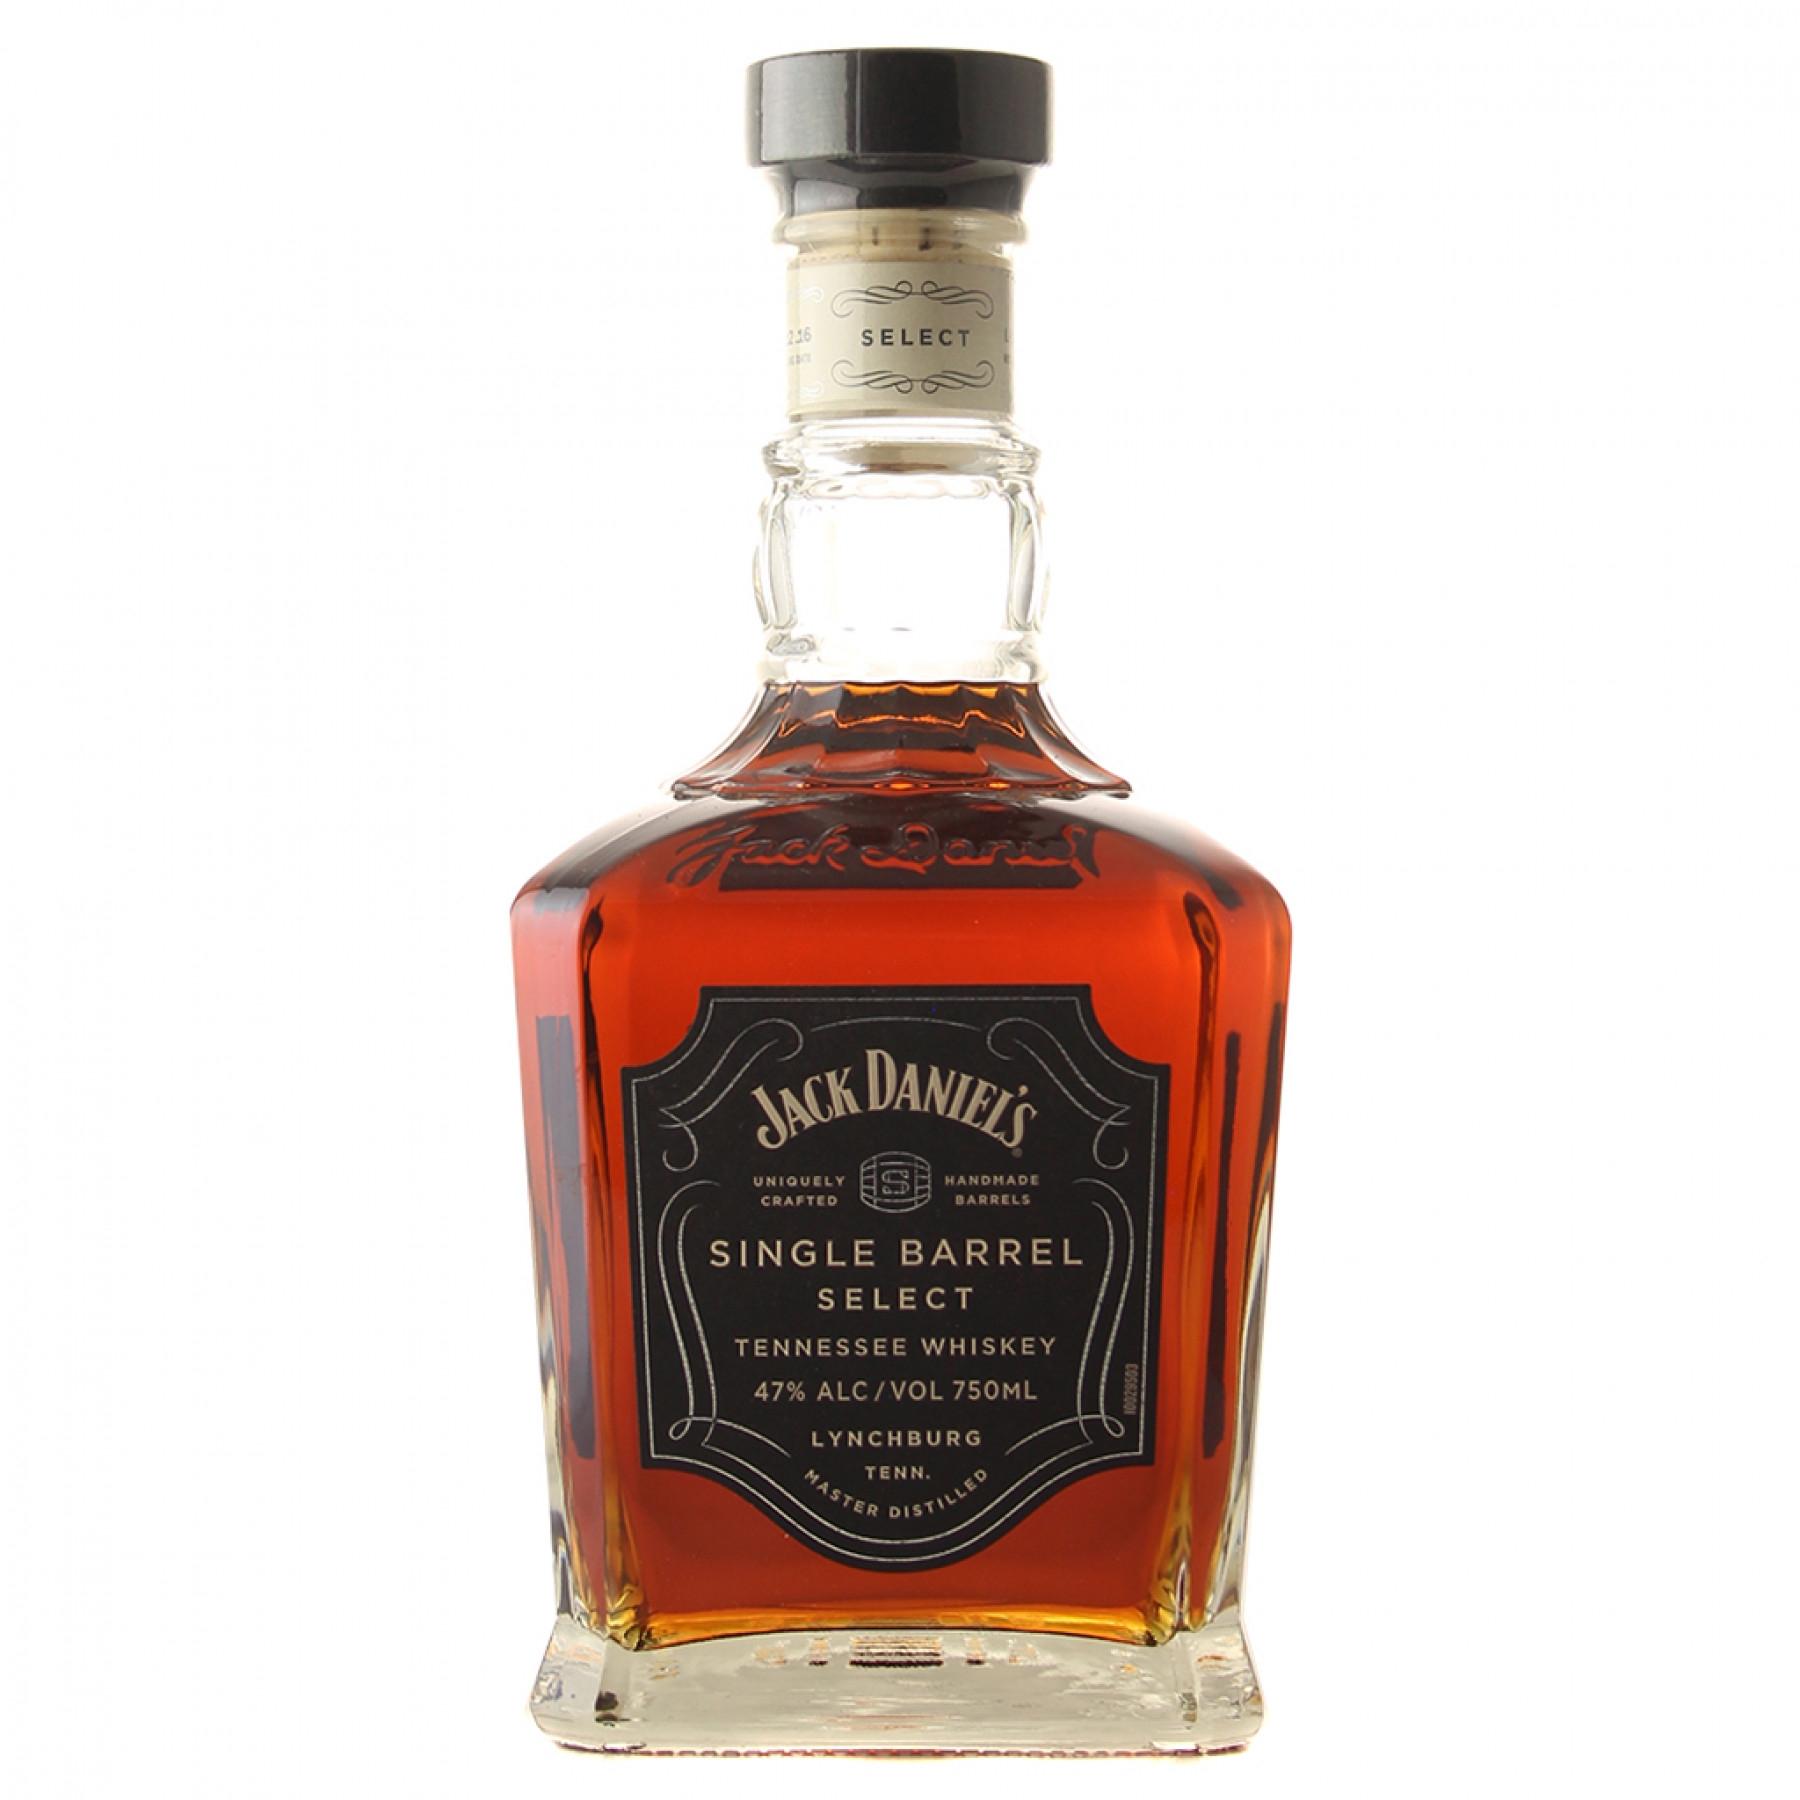 Jack Daniels, $68